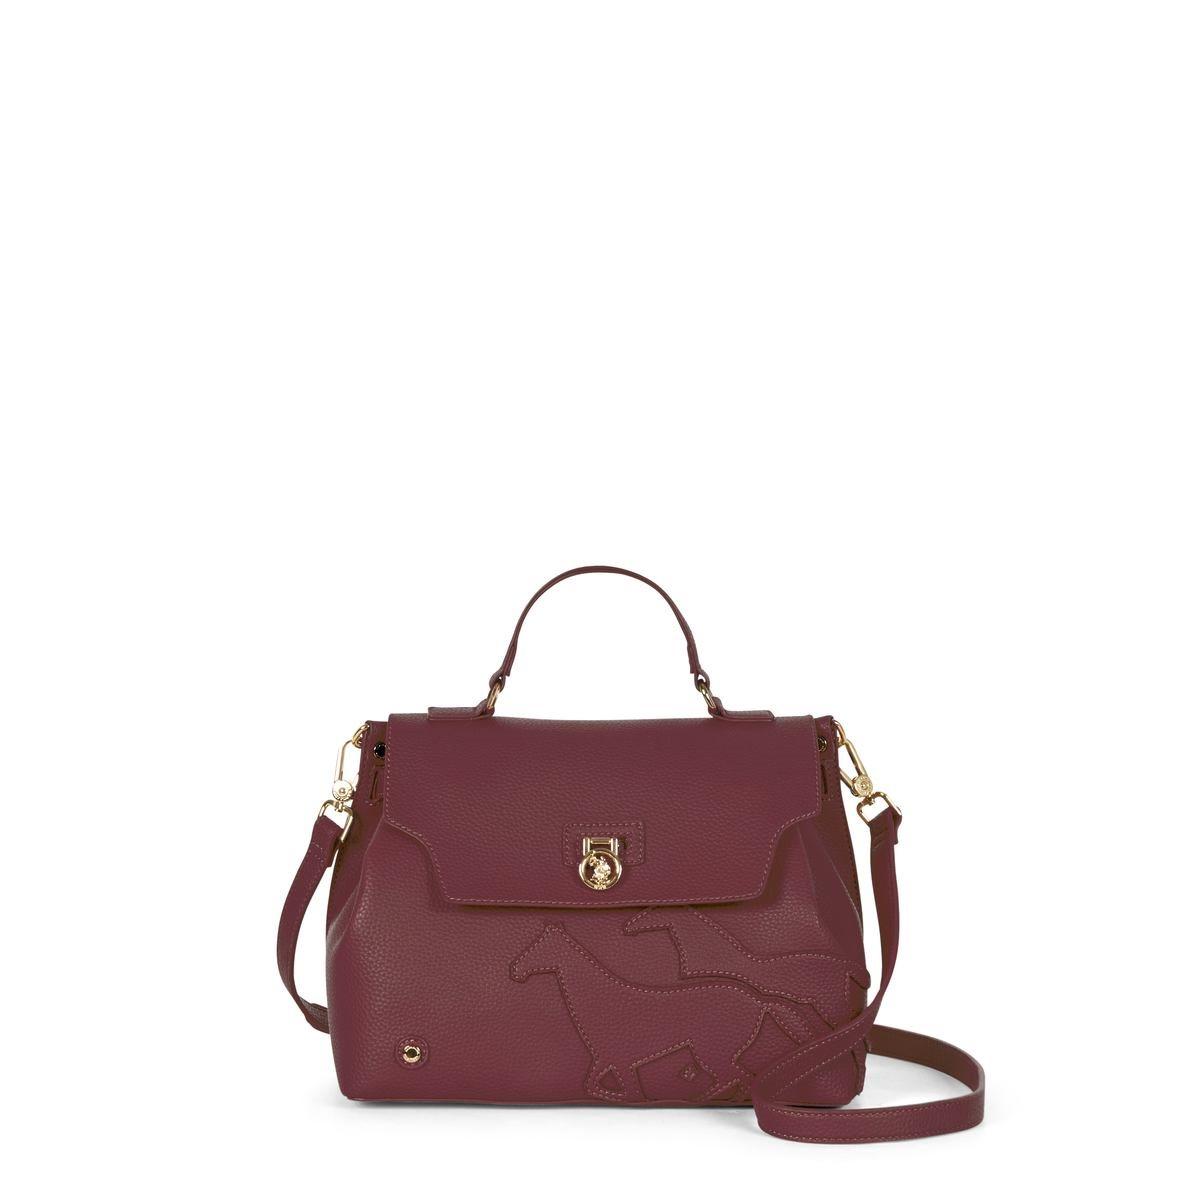 US Polo Assn. Τσάντα χειρός 29x13x21cm Newport Bordeaux